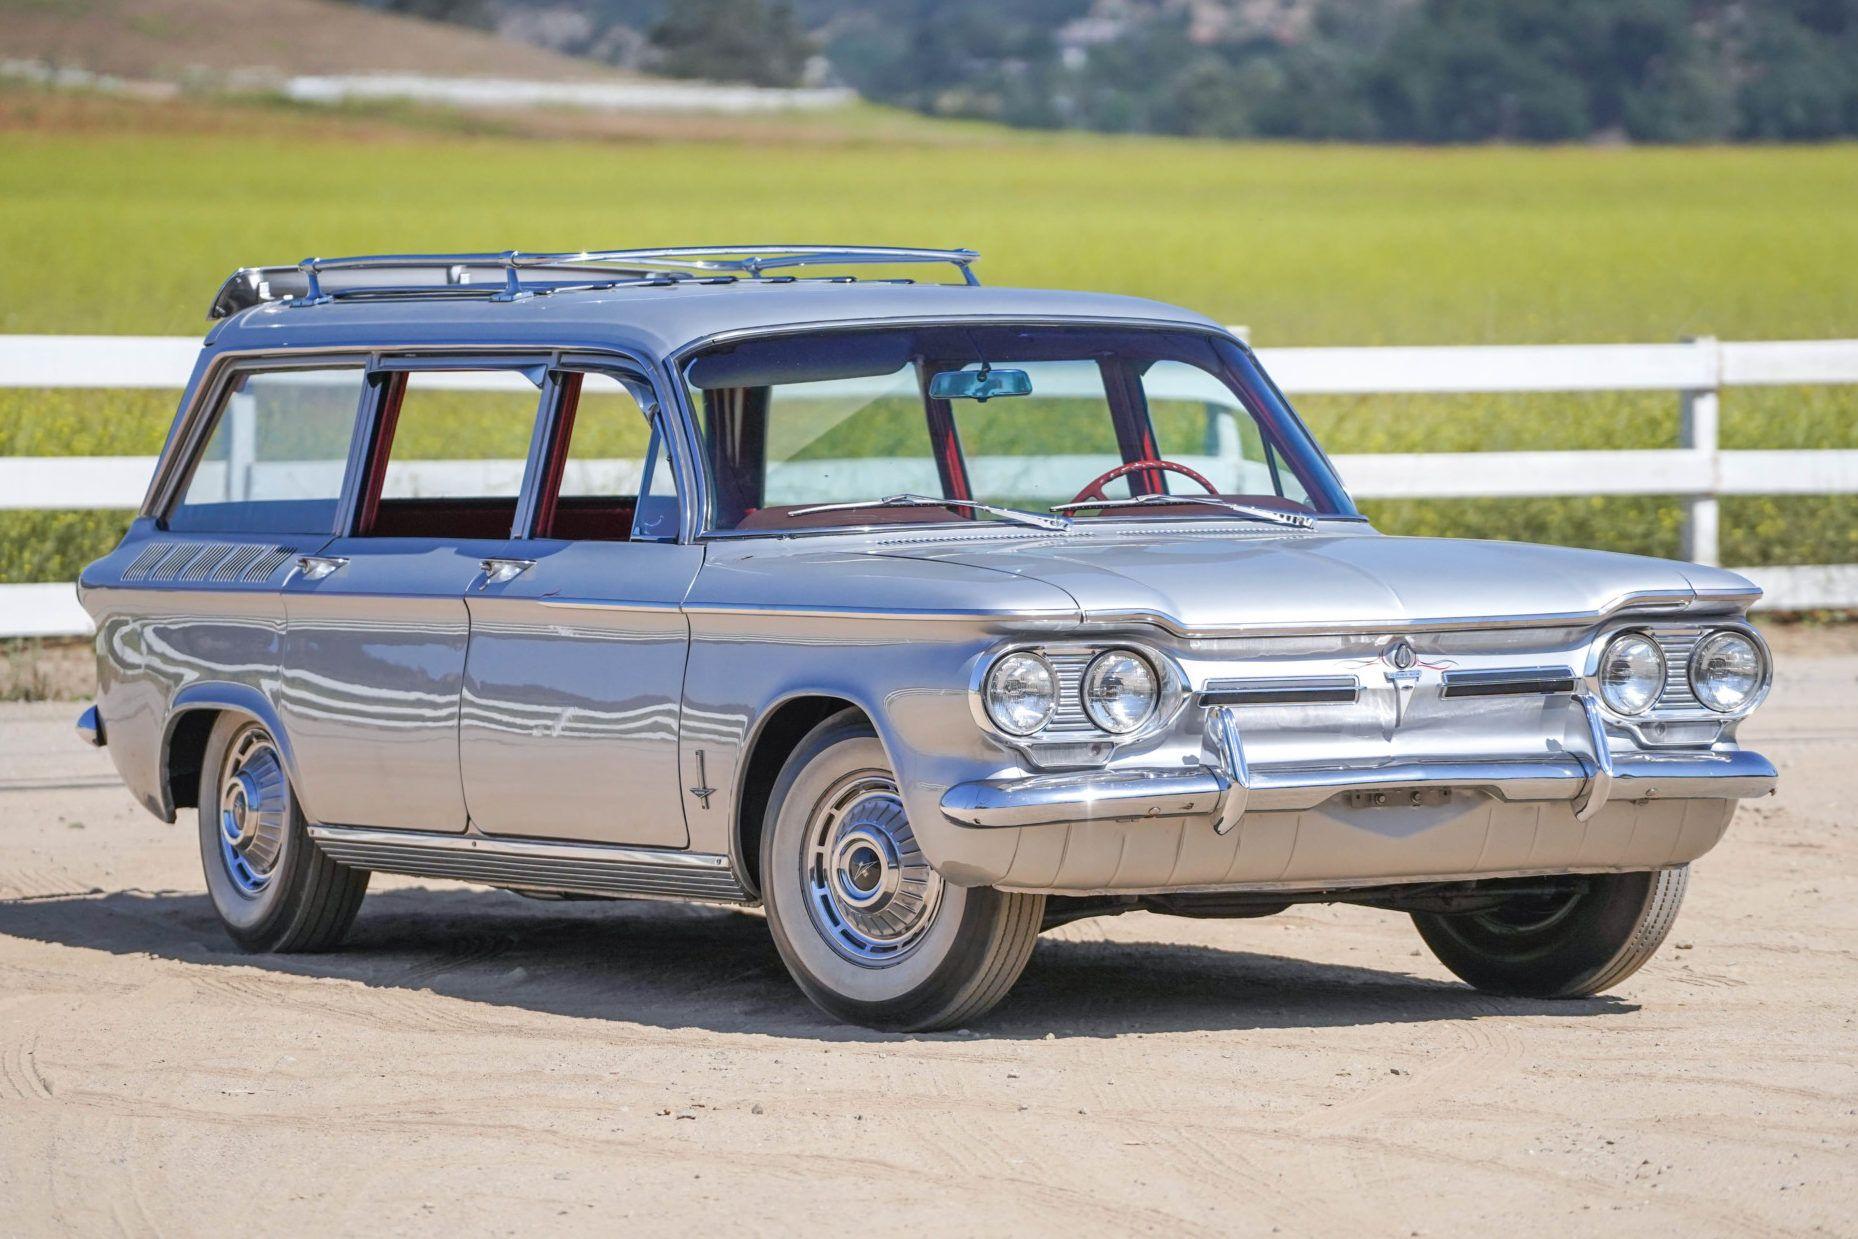 1962 Chevrolet Corvair Monza Wagon 4 Speed Chevrolet Corvair Chevrolet Wagon